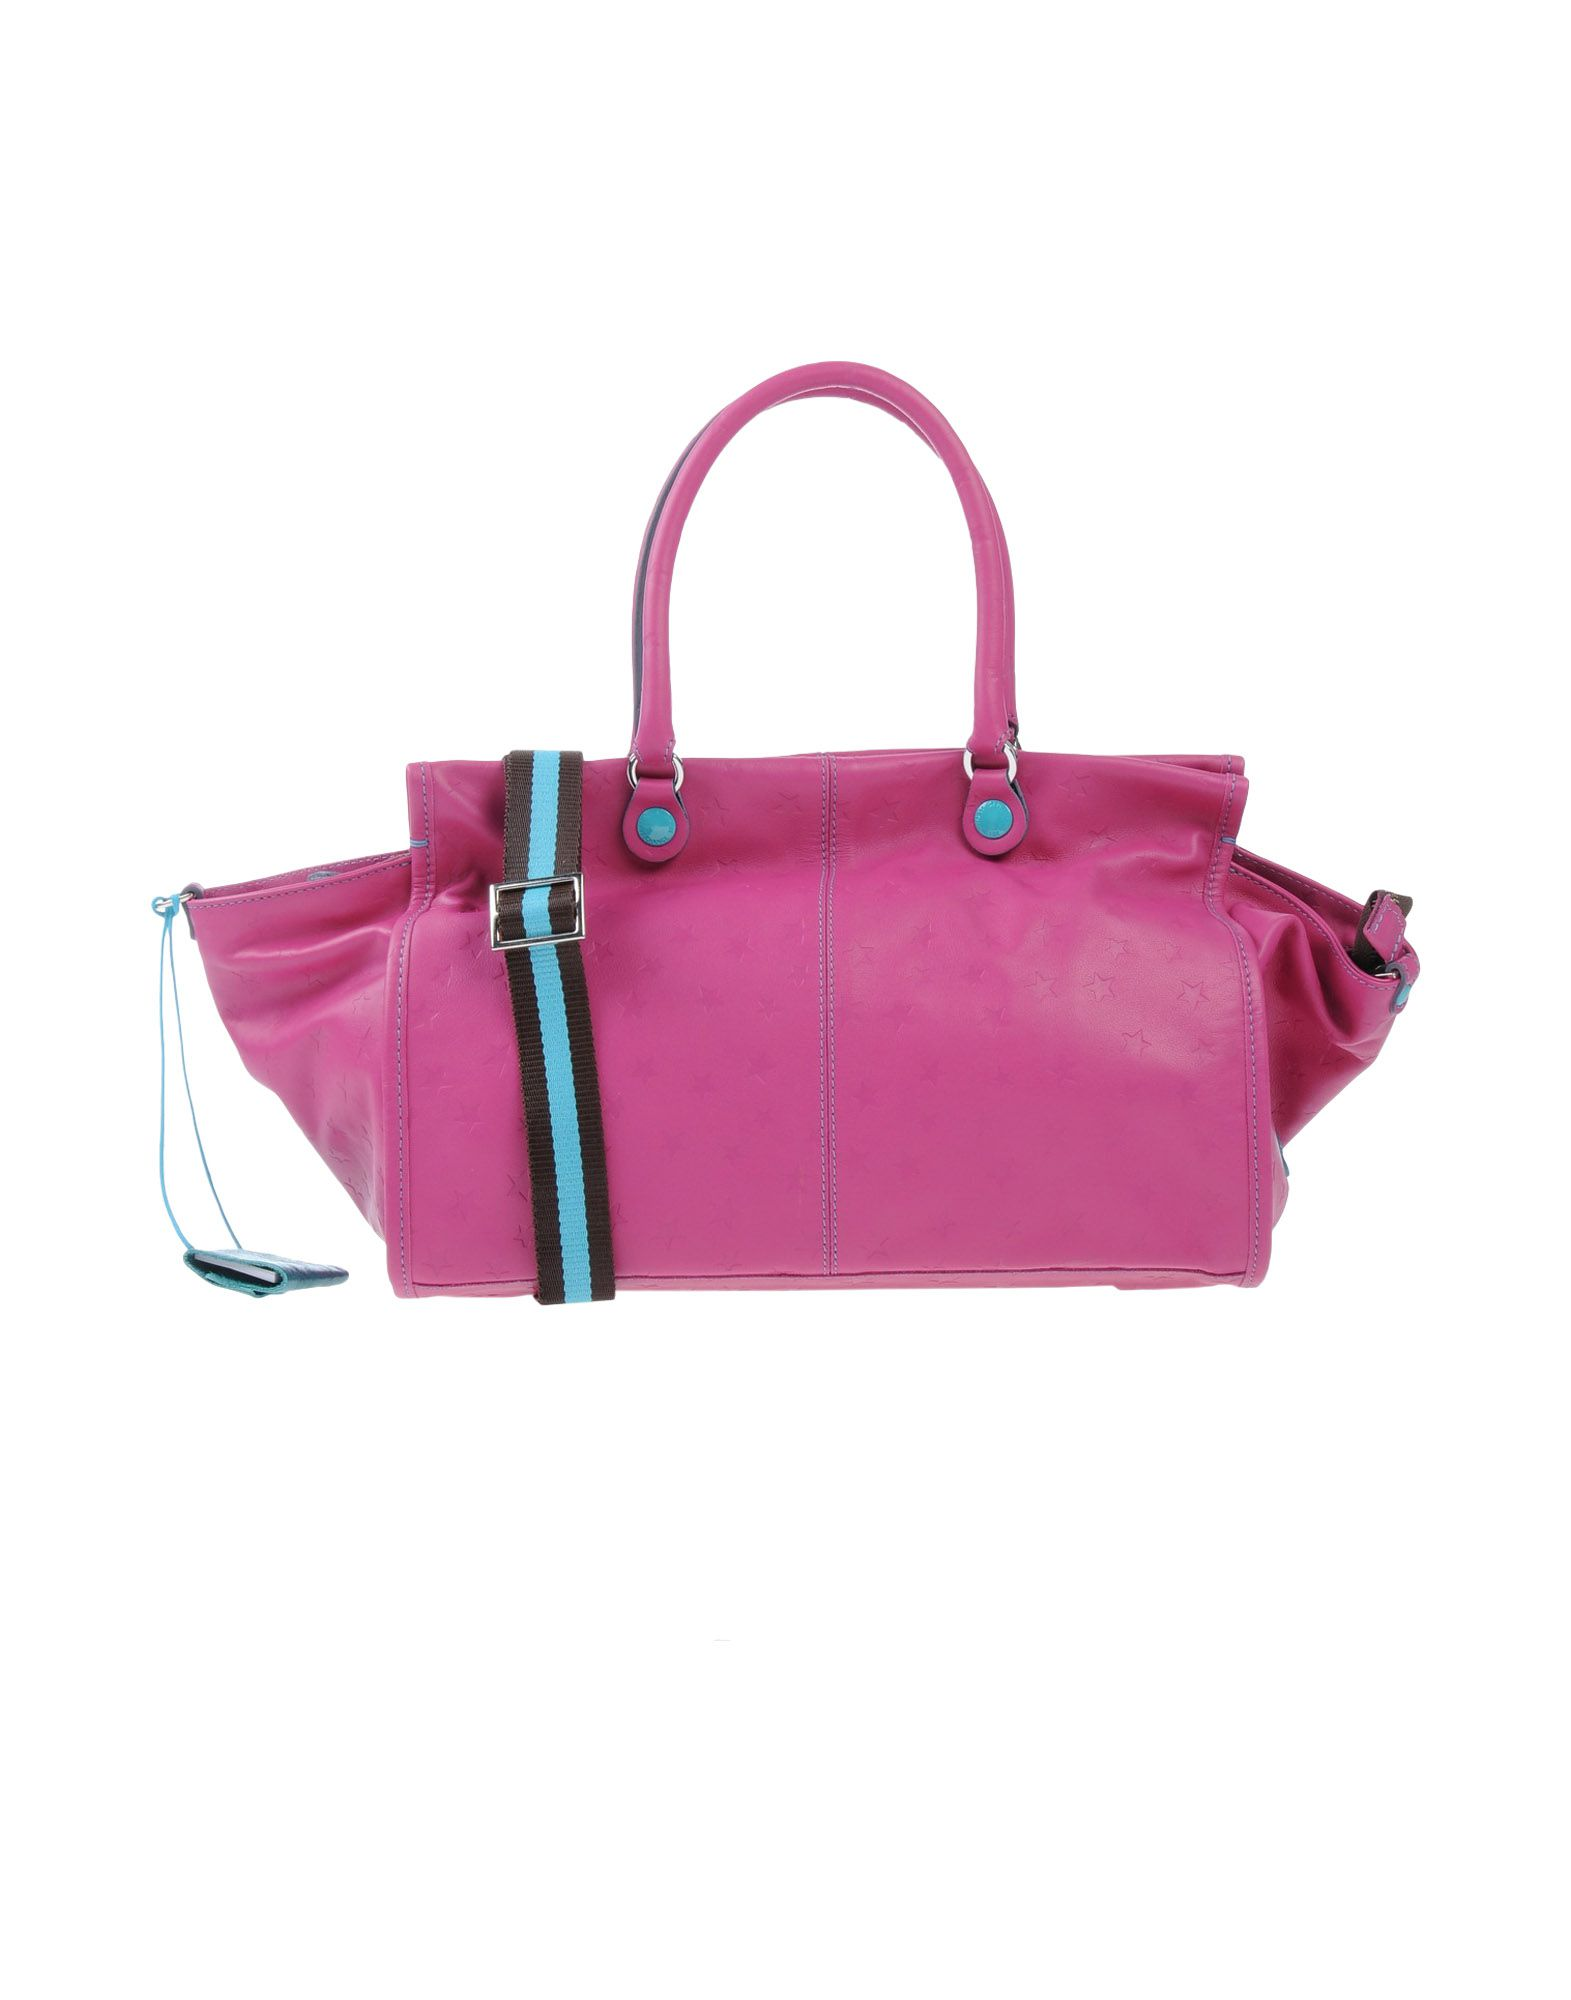 Gabs Handbag Fuchsia